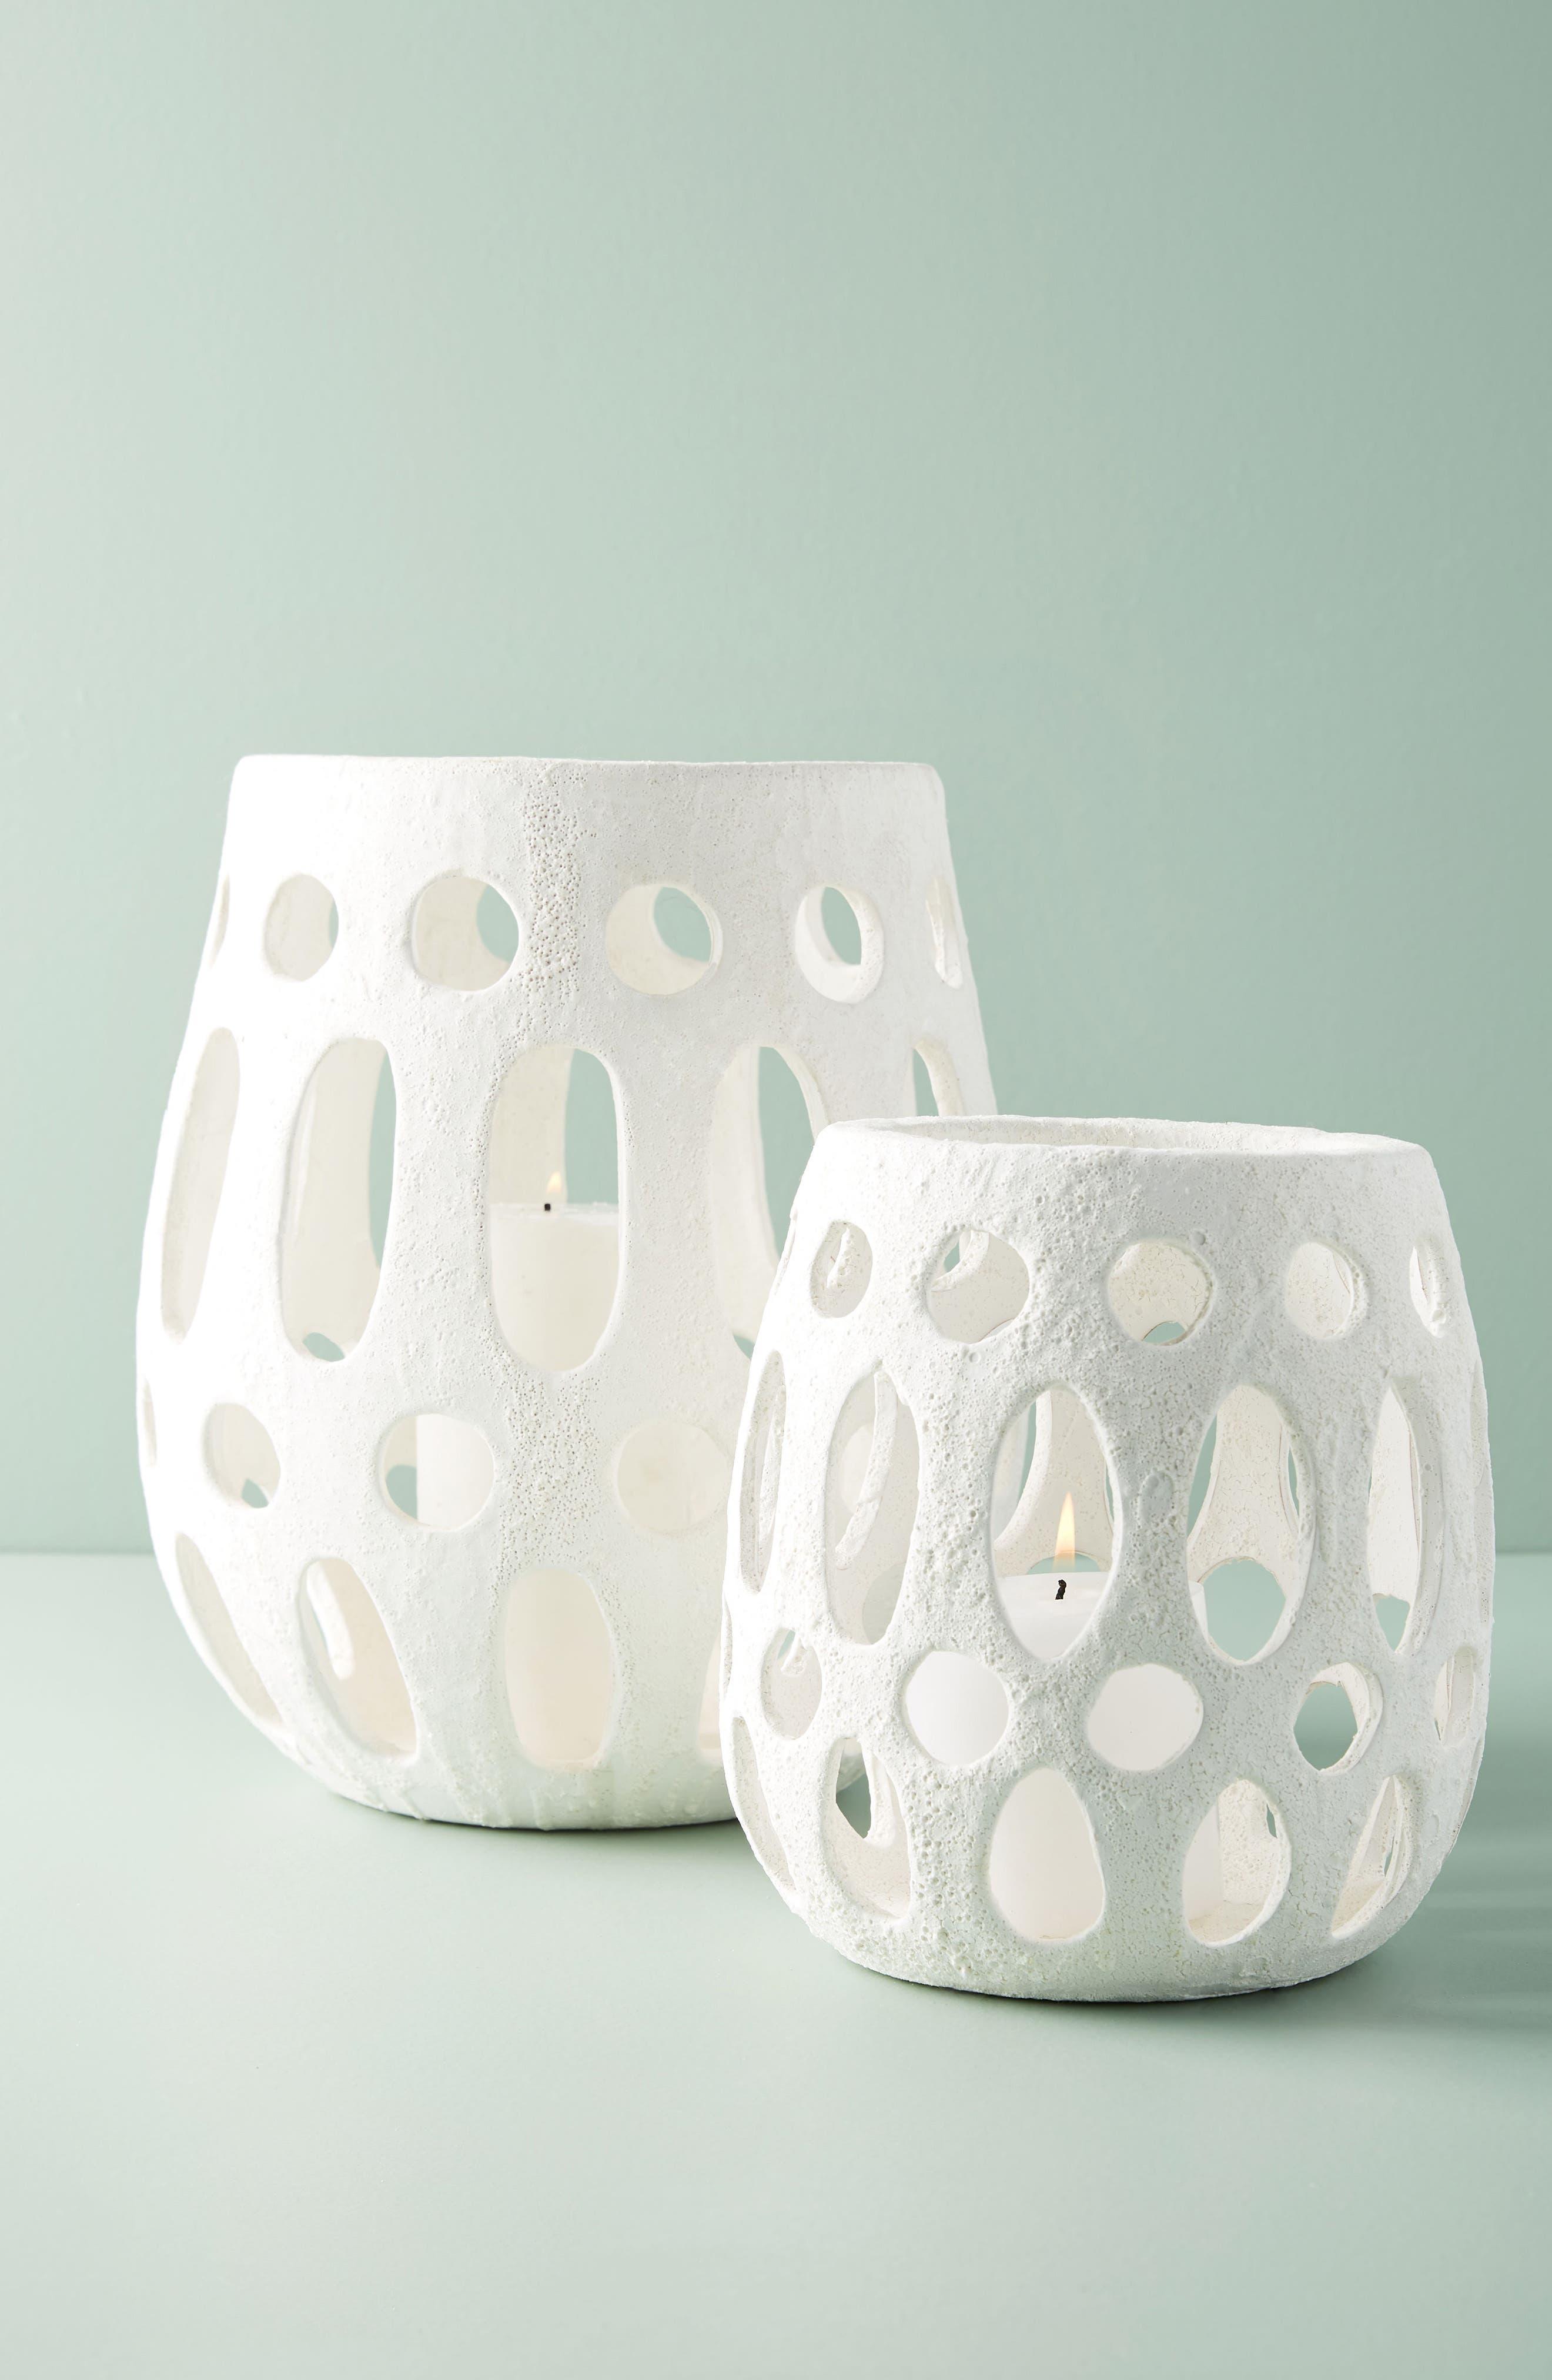 Hand Carved Ceramic Hurricane Candleholder,                             Main thumbnail 1, color,                             WHITE - LARGE